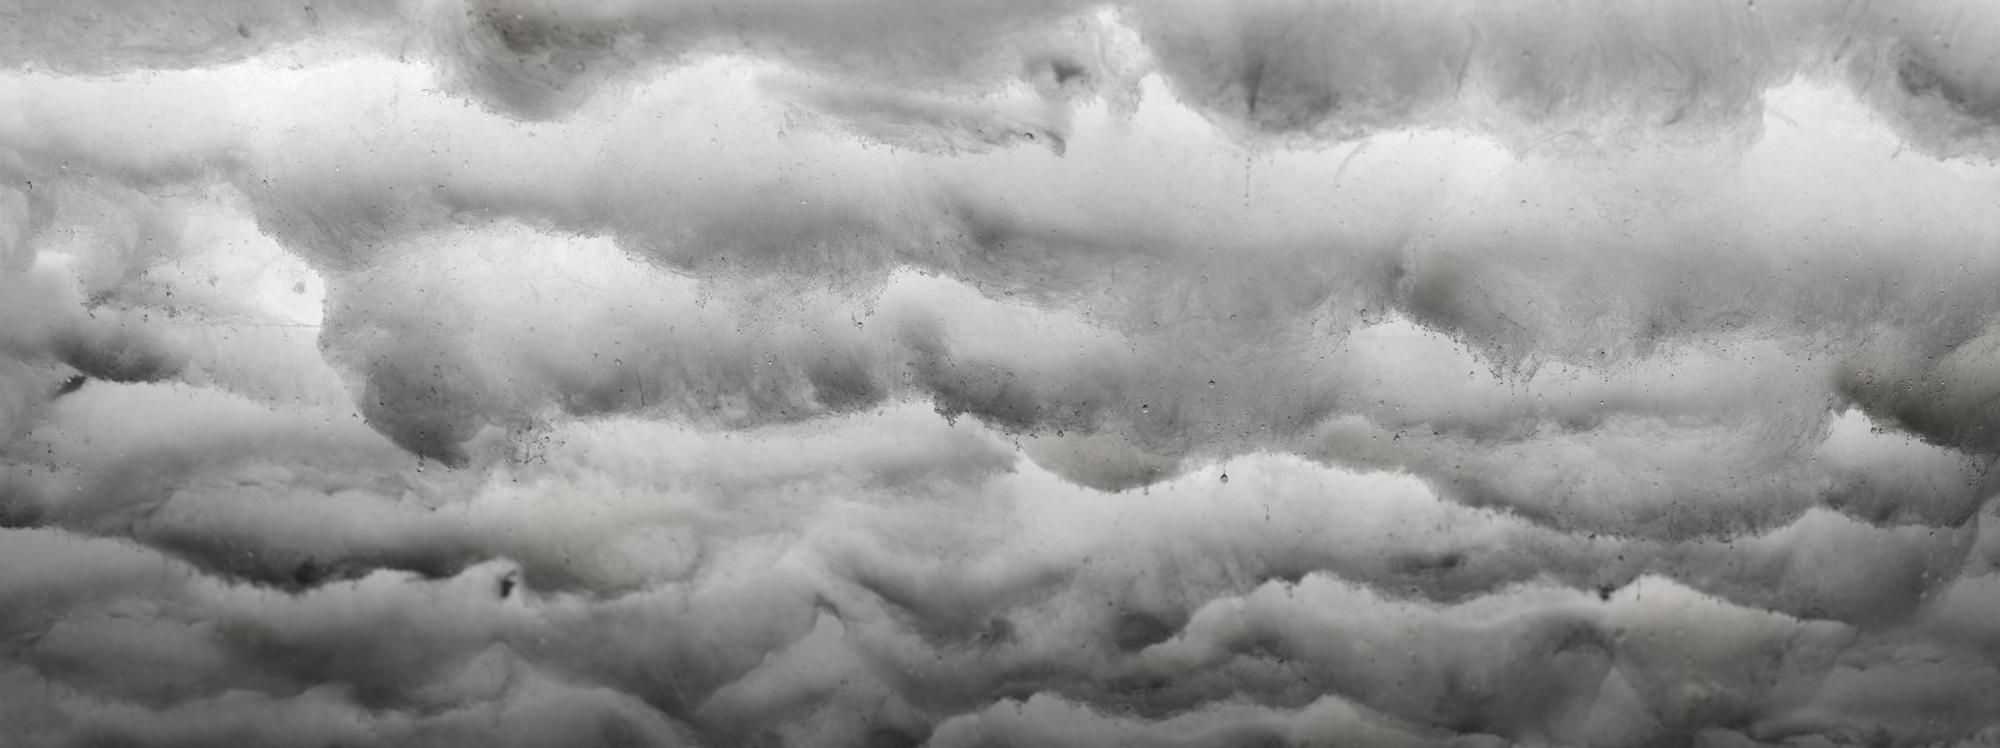 DAVID LAWREY & JAKI MIDDLETON  Downfall #1  2016 c-type metallic print 126 × 48 cm (framed)